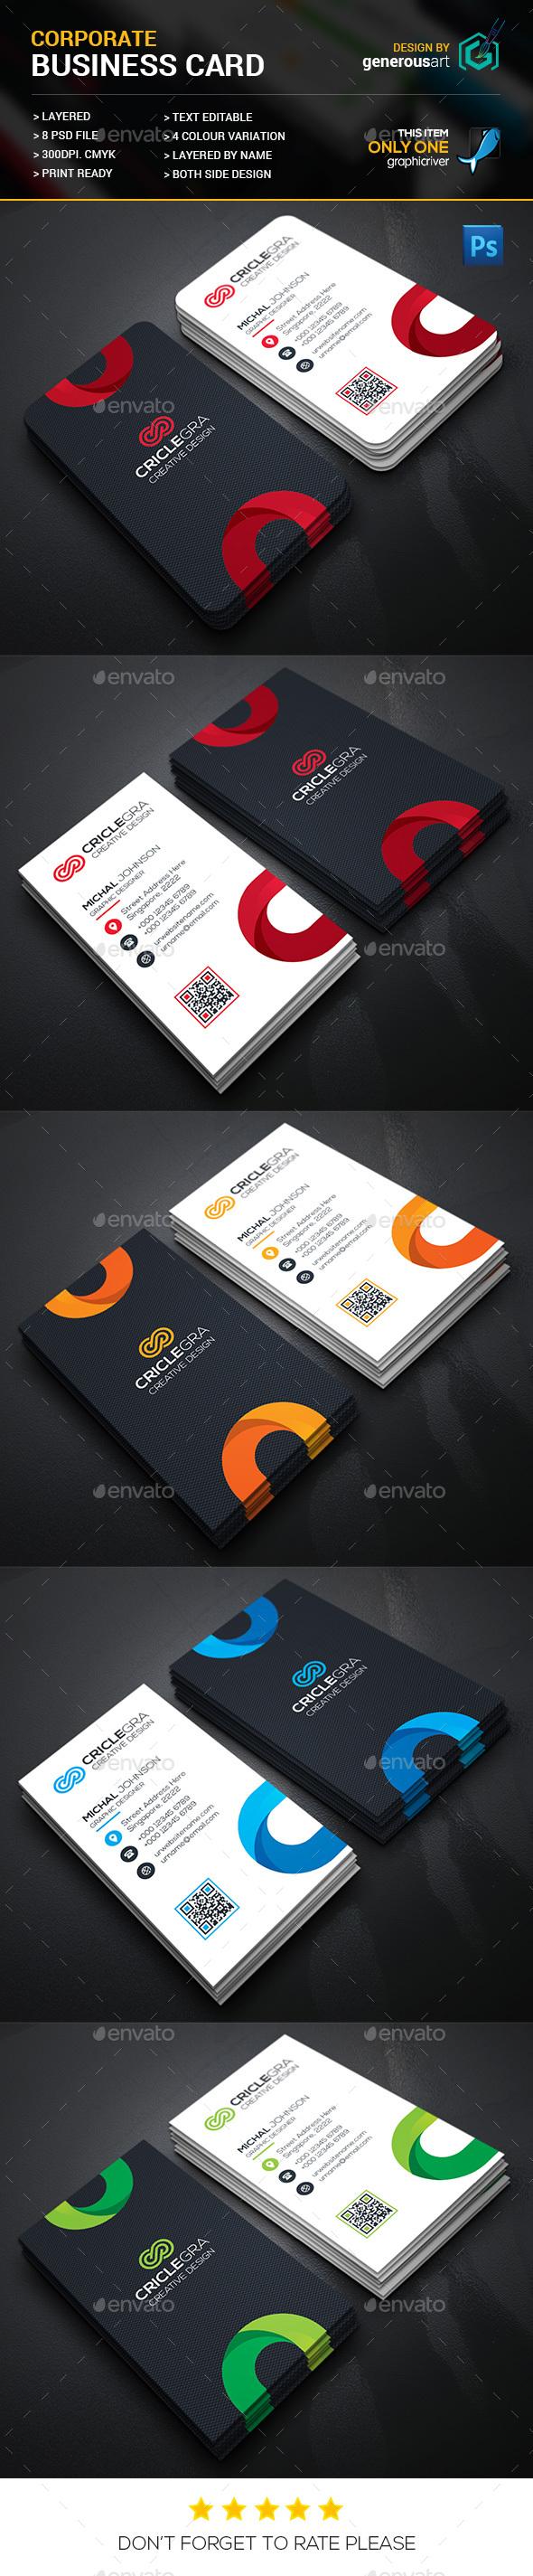 CricleGra Business Card - Business Cards Print Templates